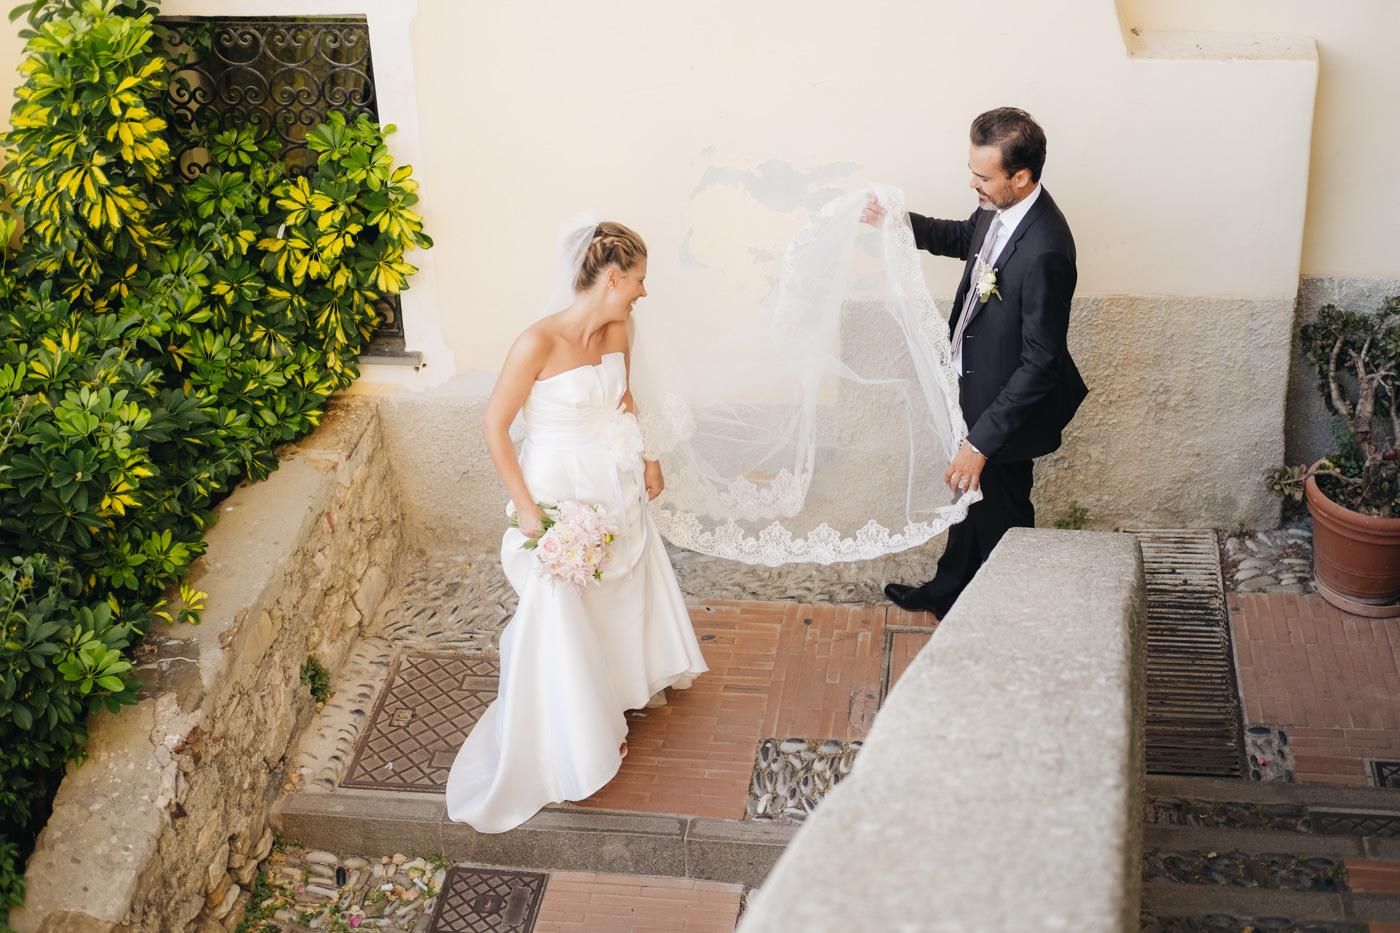 matrimoni_all_italiana_fotografo_matrimonio_cinque_terre-43.jpg